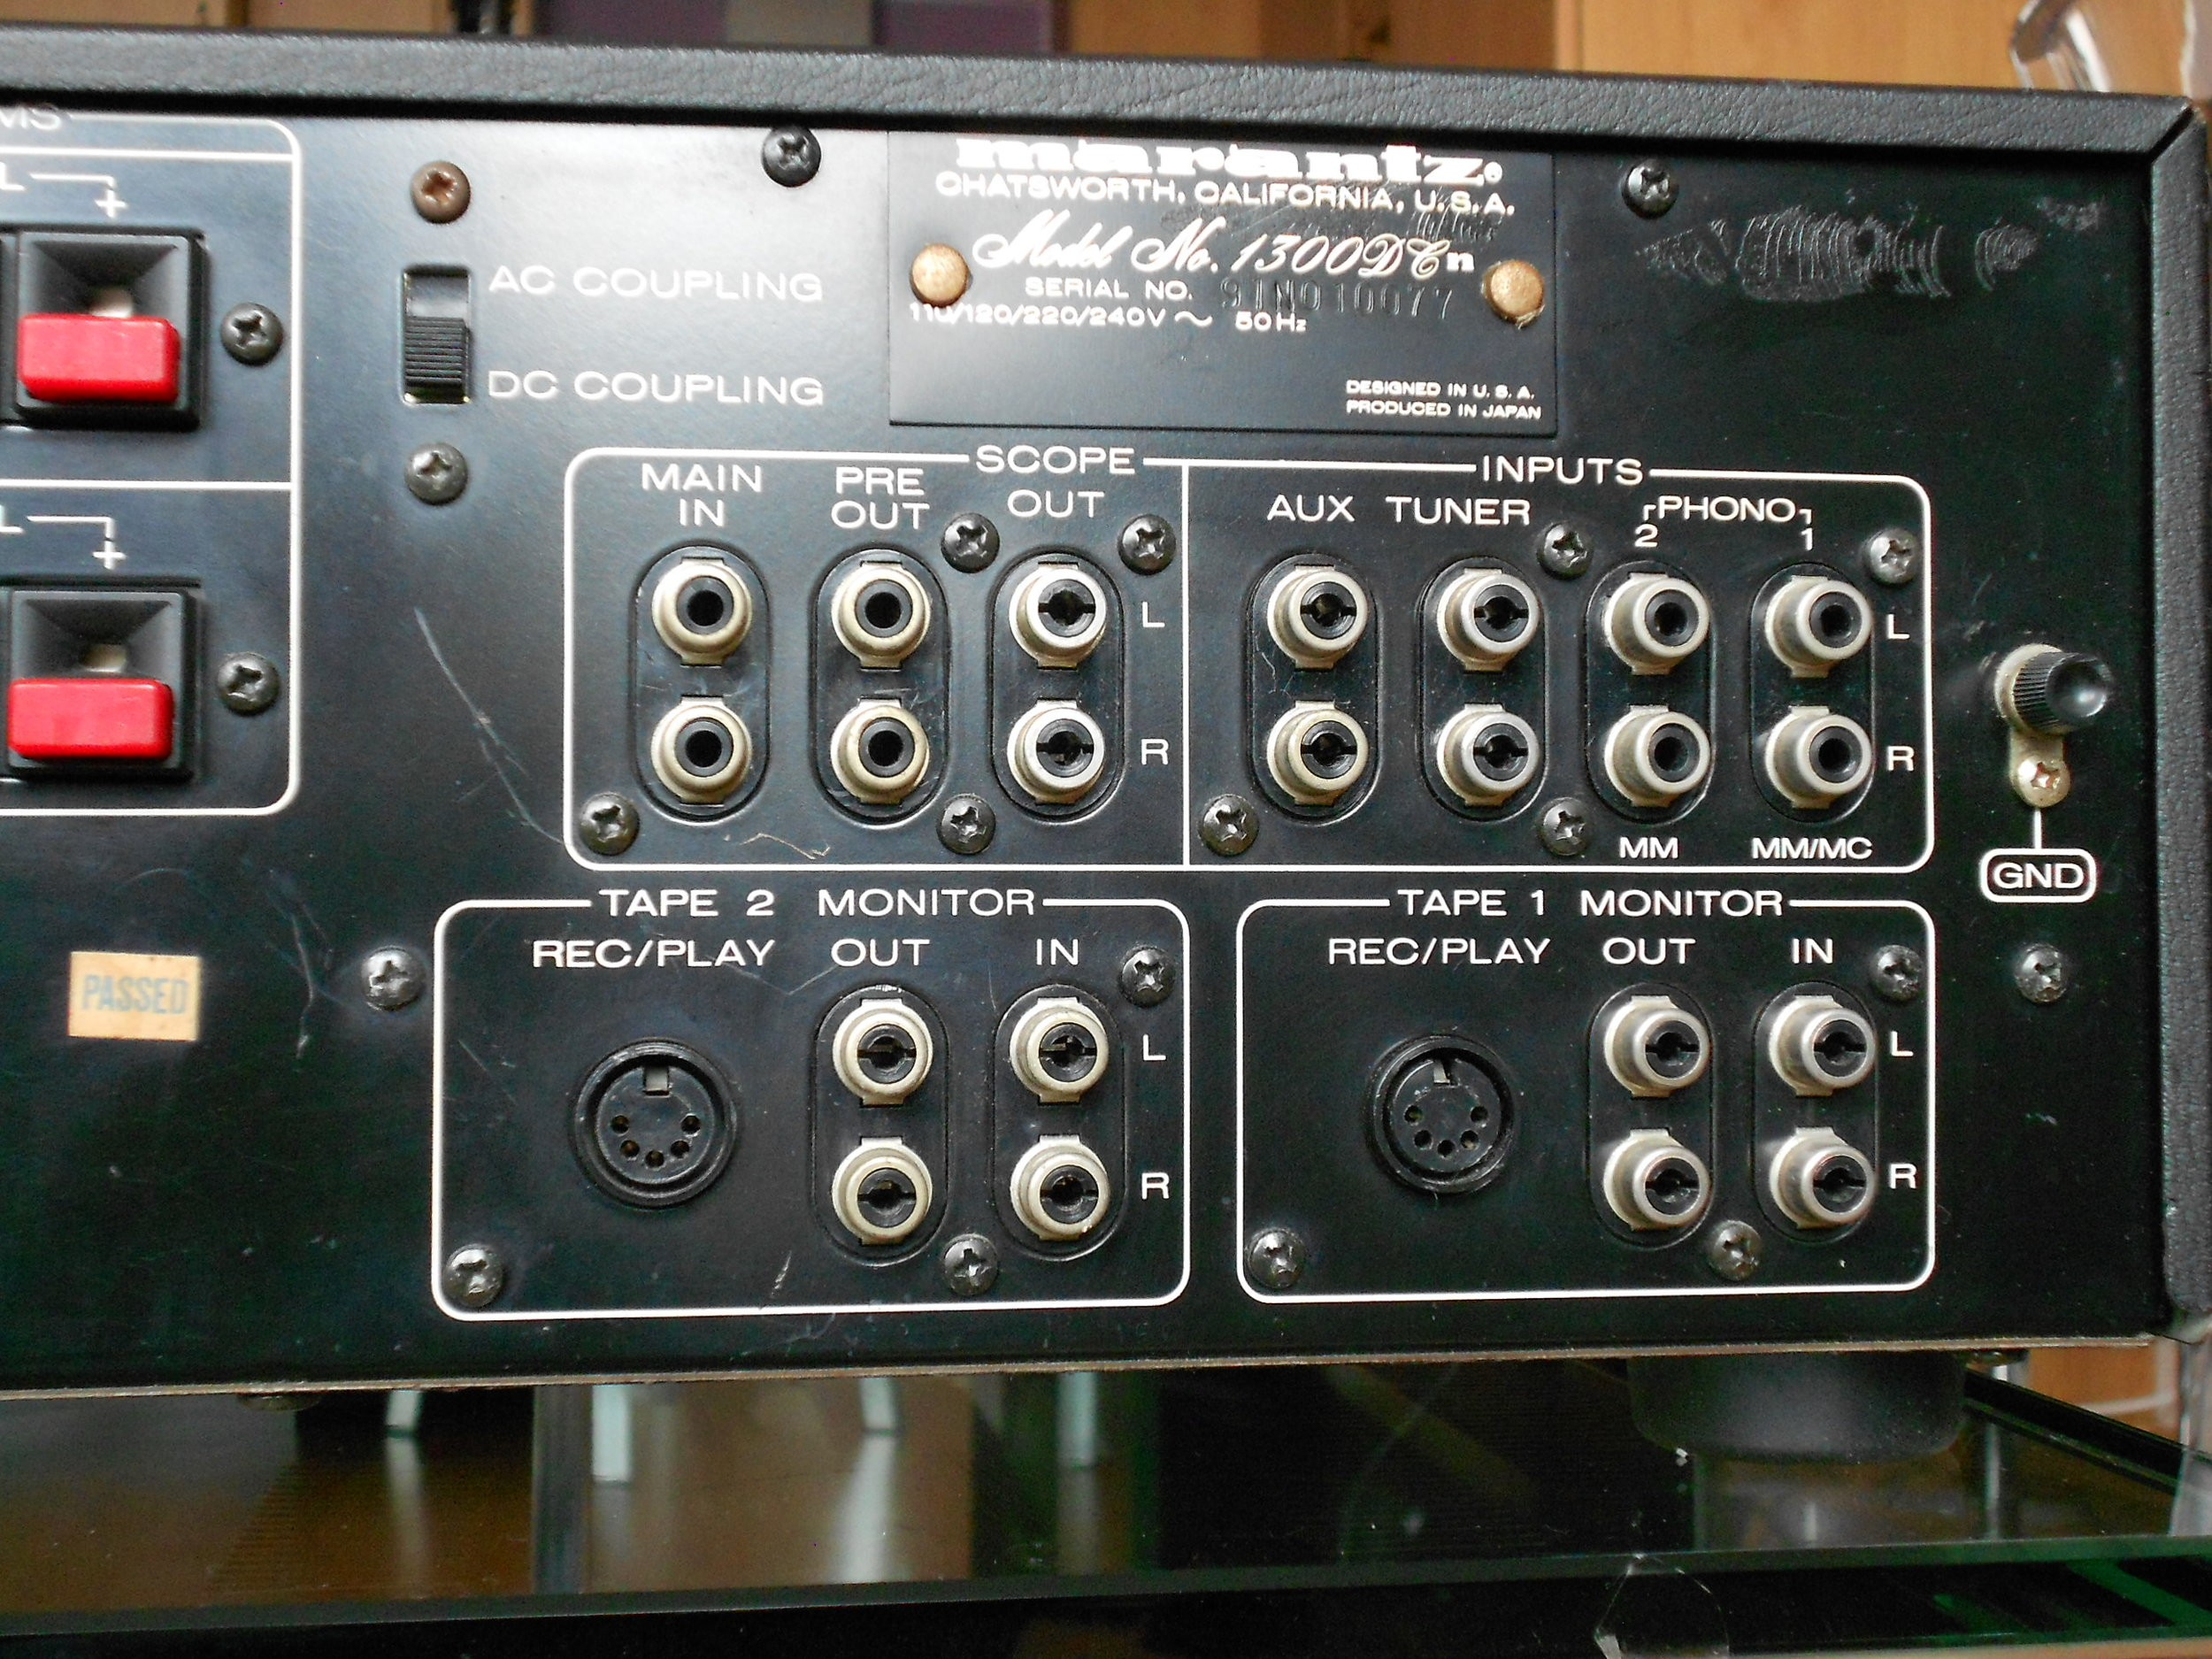 Marantz 1300DC amplifier rear view.